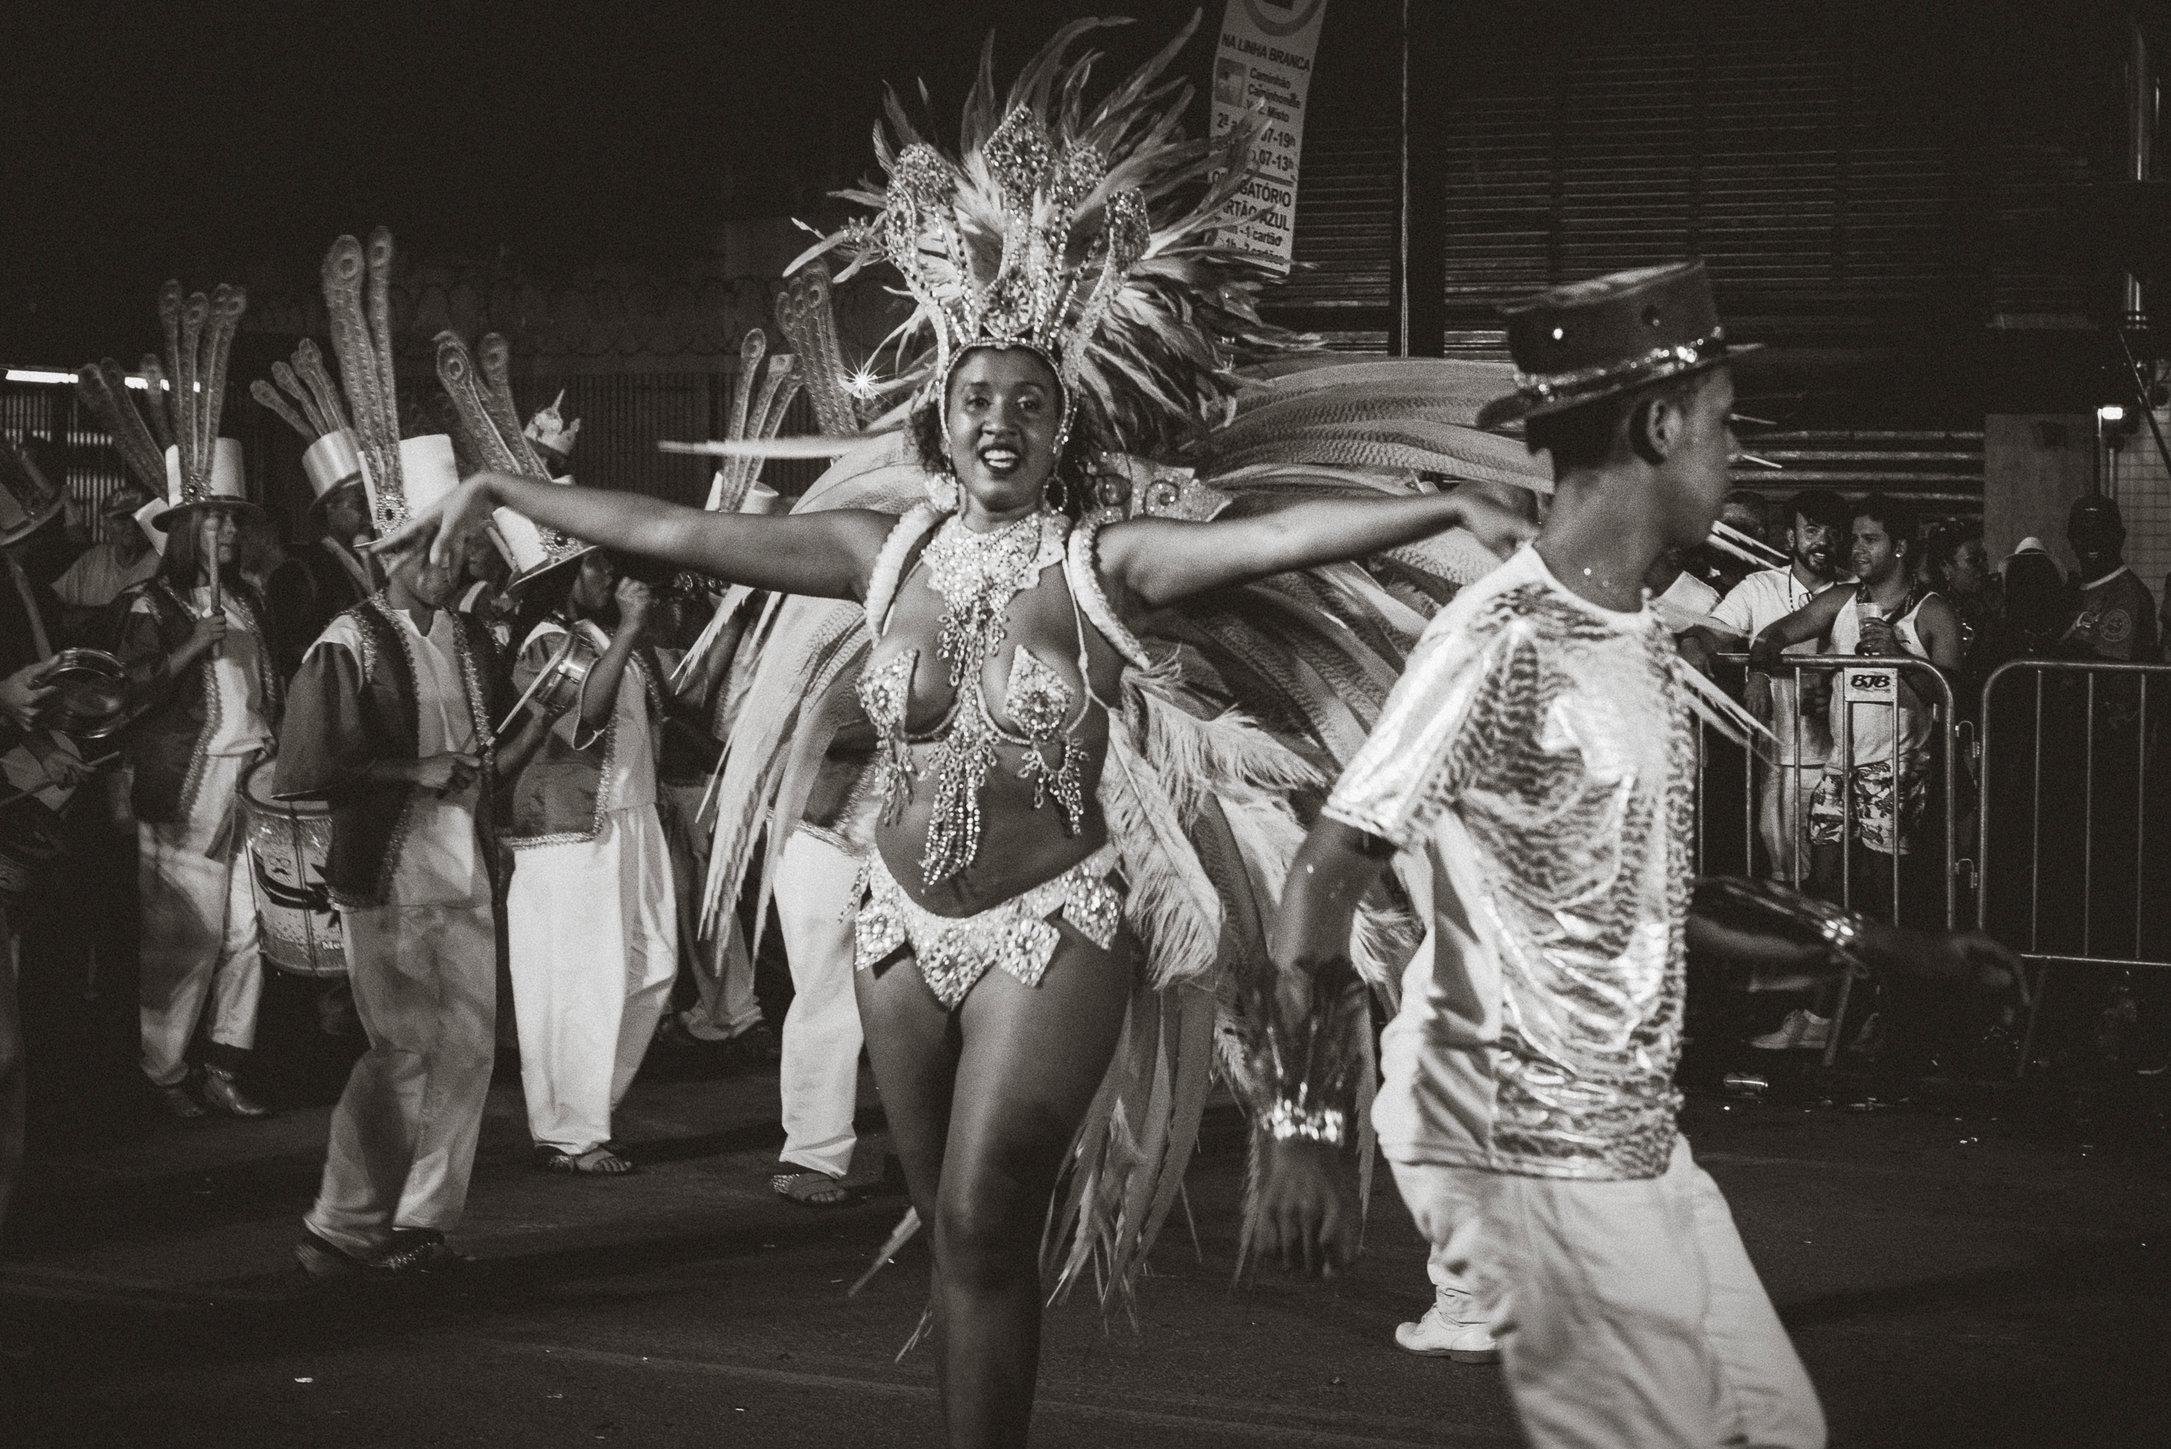 20180212-Carnaval-101.jpg